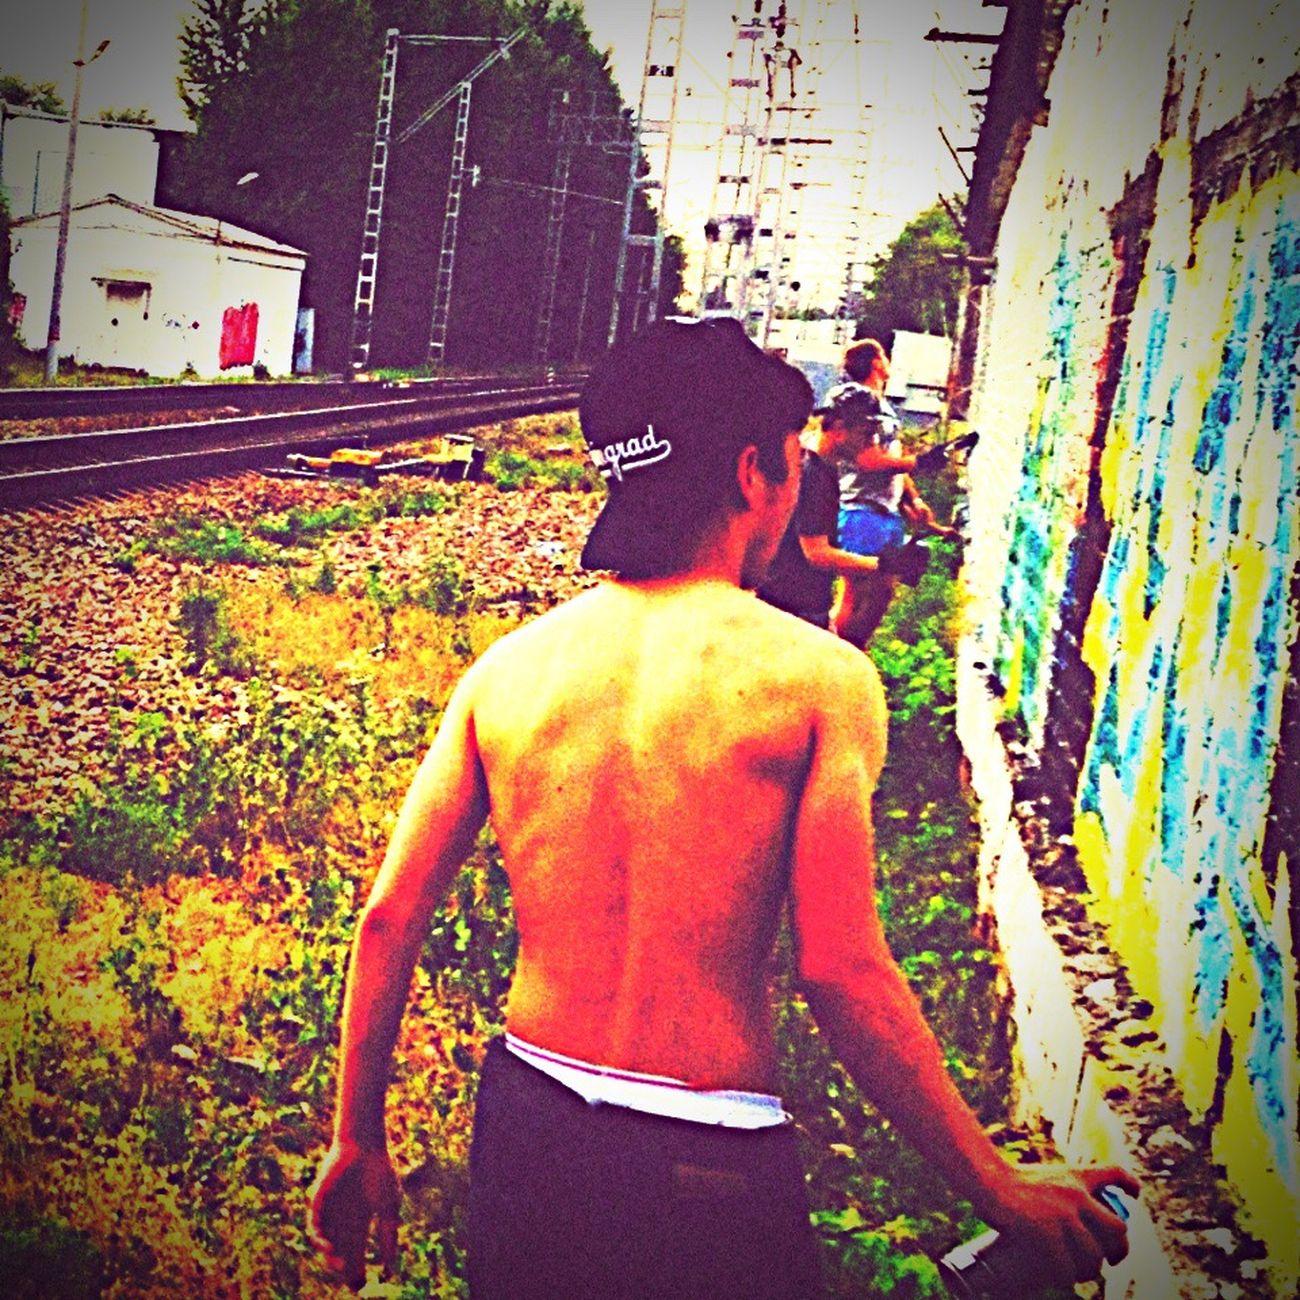 Hooligan4life Hool Enjoying Life Graffiti Art Grafitti Tpb TPB! Тпб TopBand